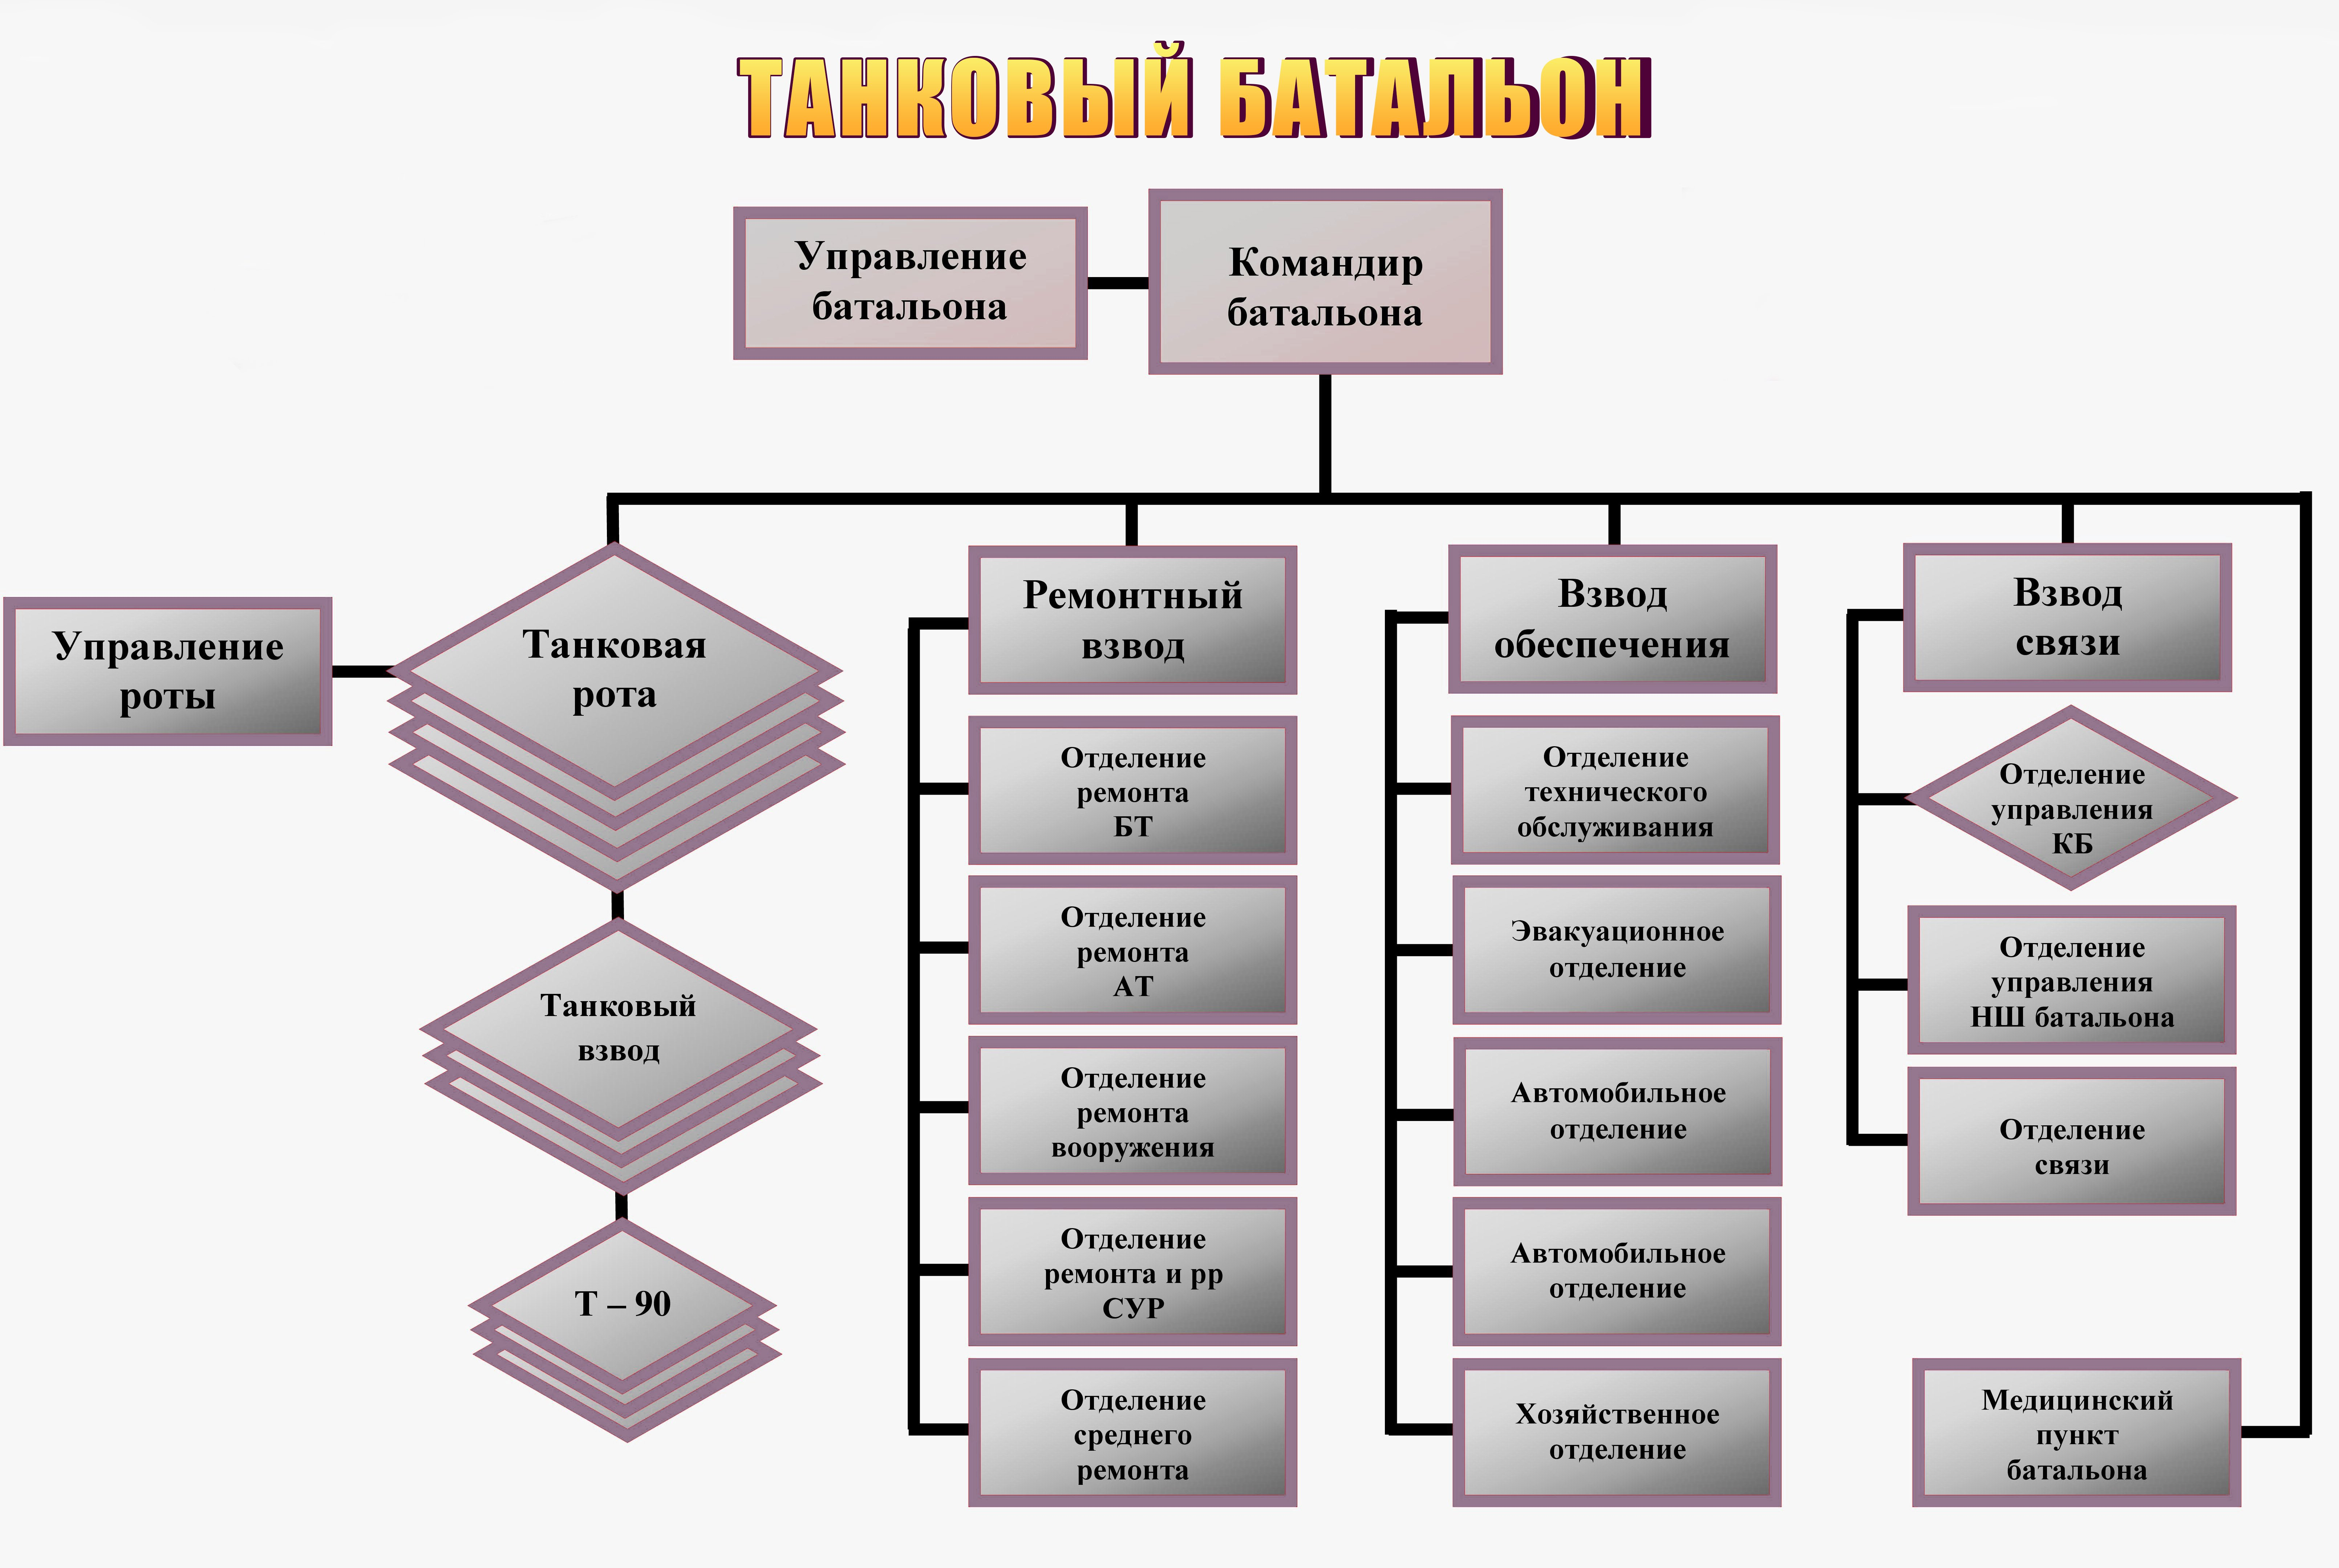 структура батальона